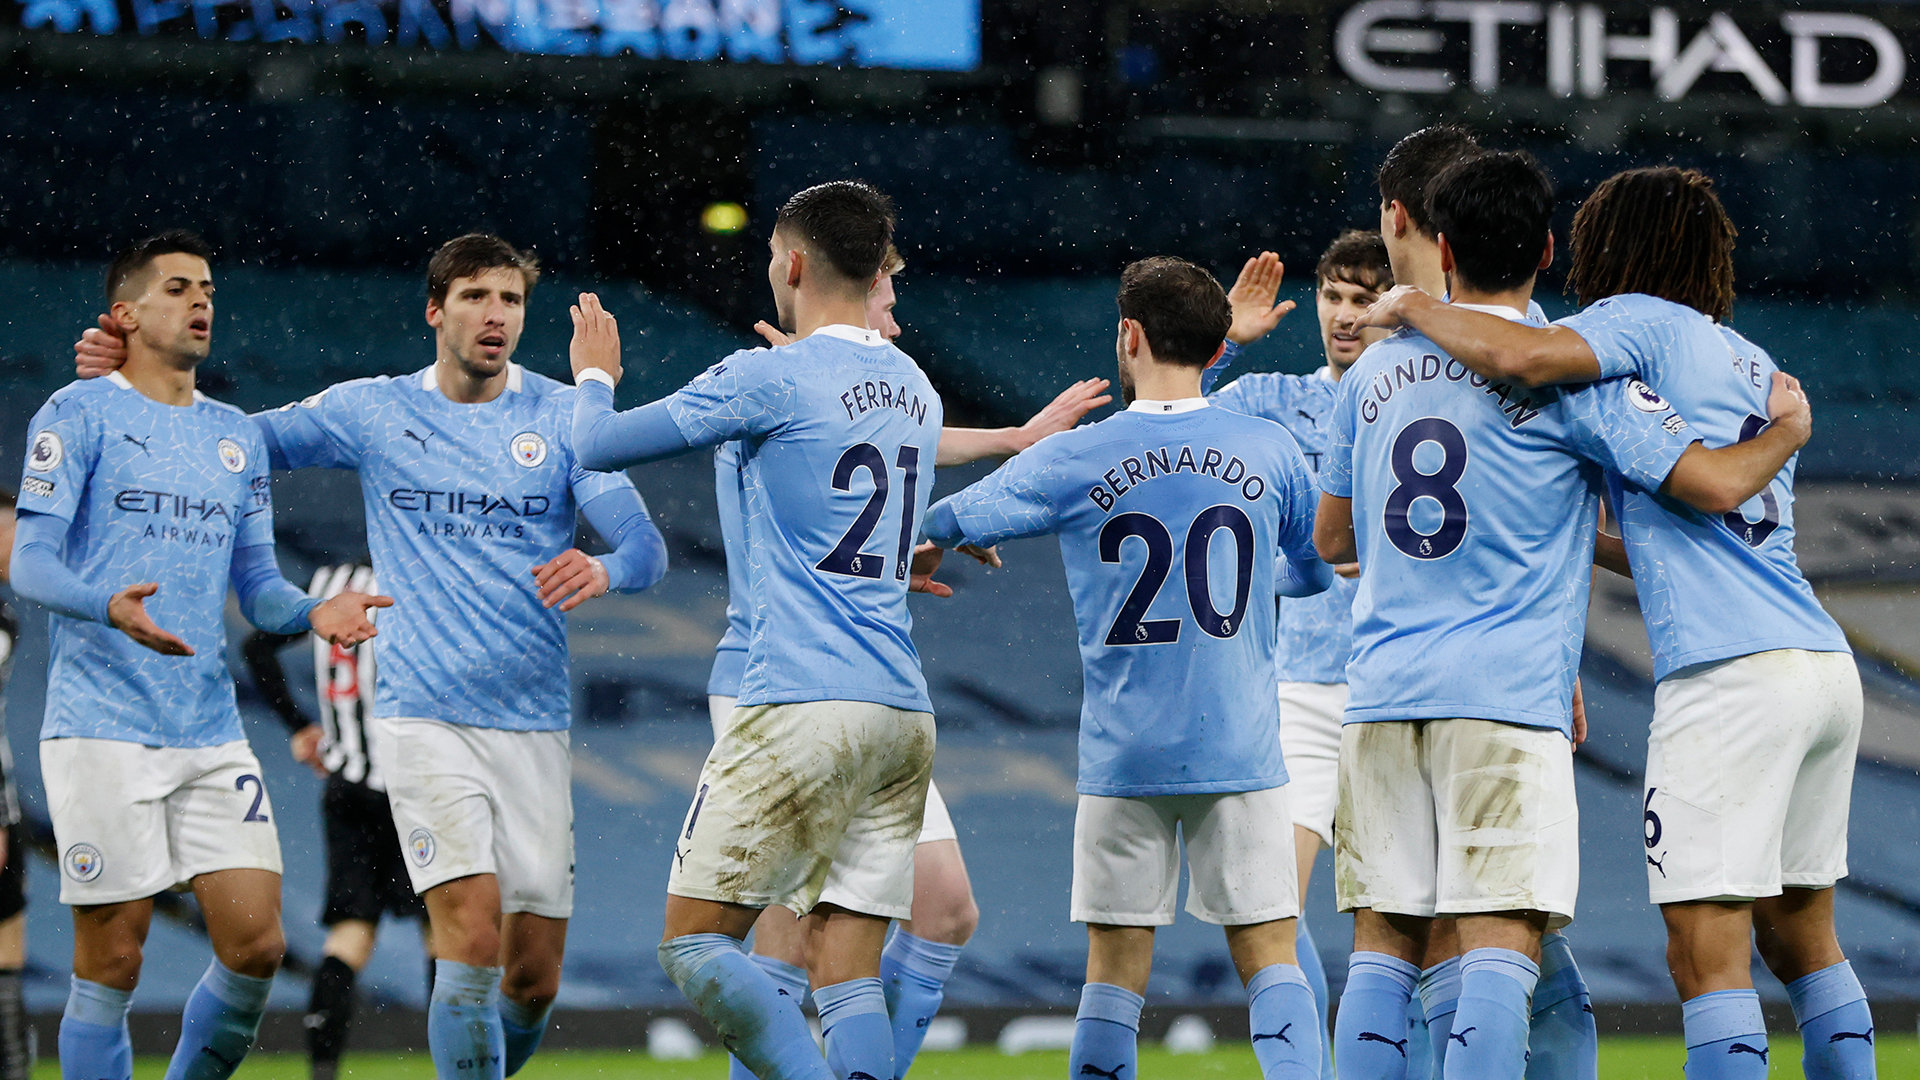 Champions League heute live im Free-TV? So wird PSG vs. Manchester City  übertragen